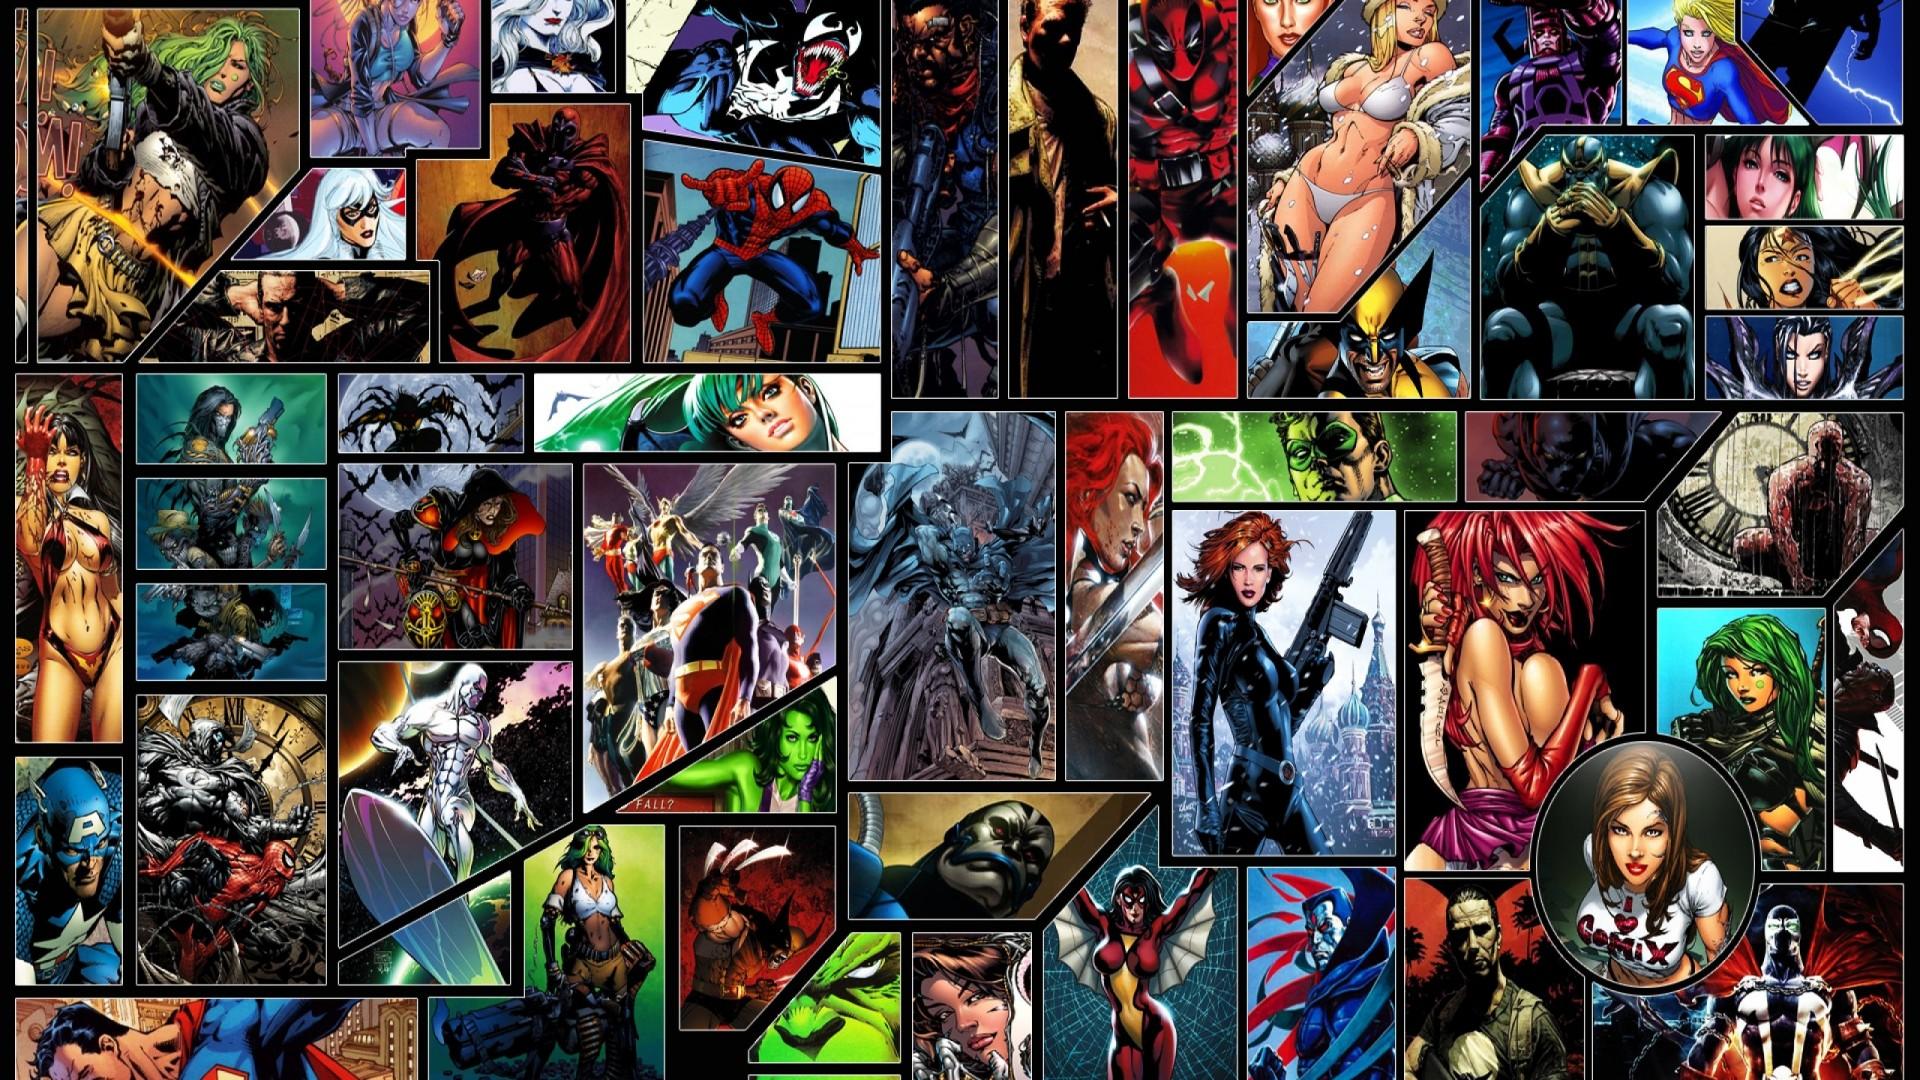 Wallpaper #62 Wallpaper From Marvel Heroes Omega